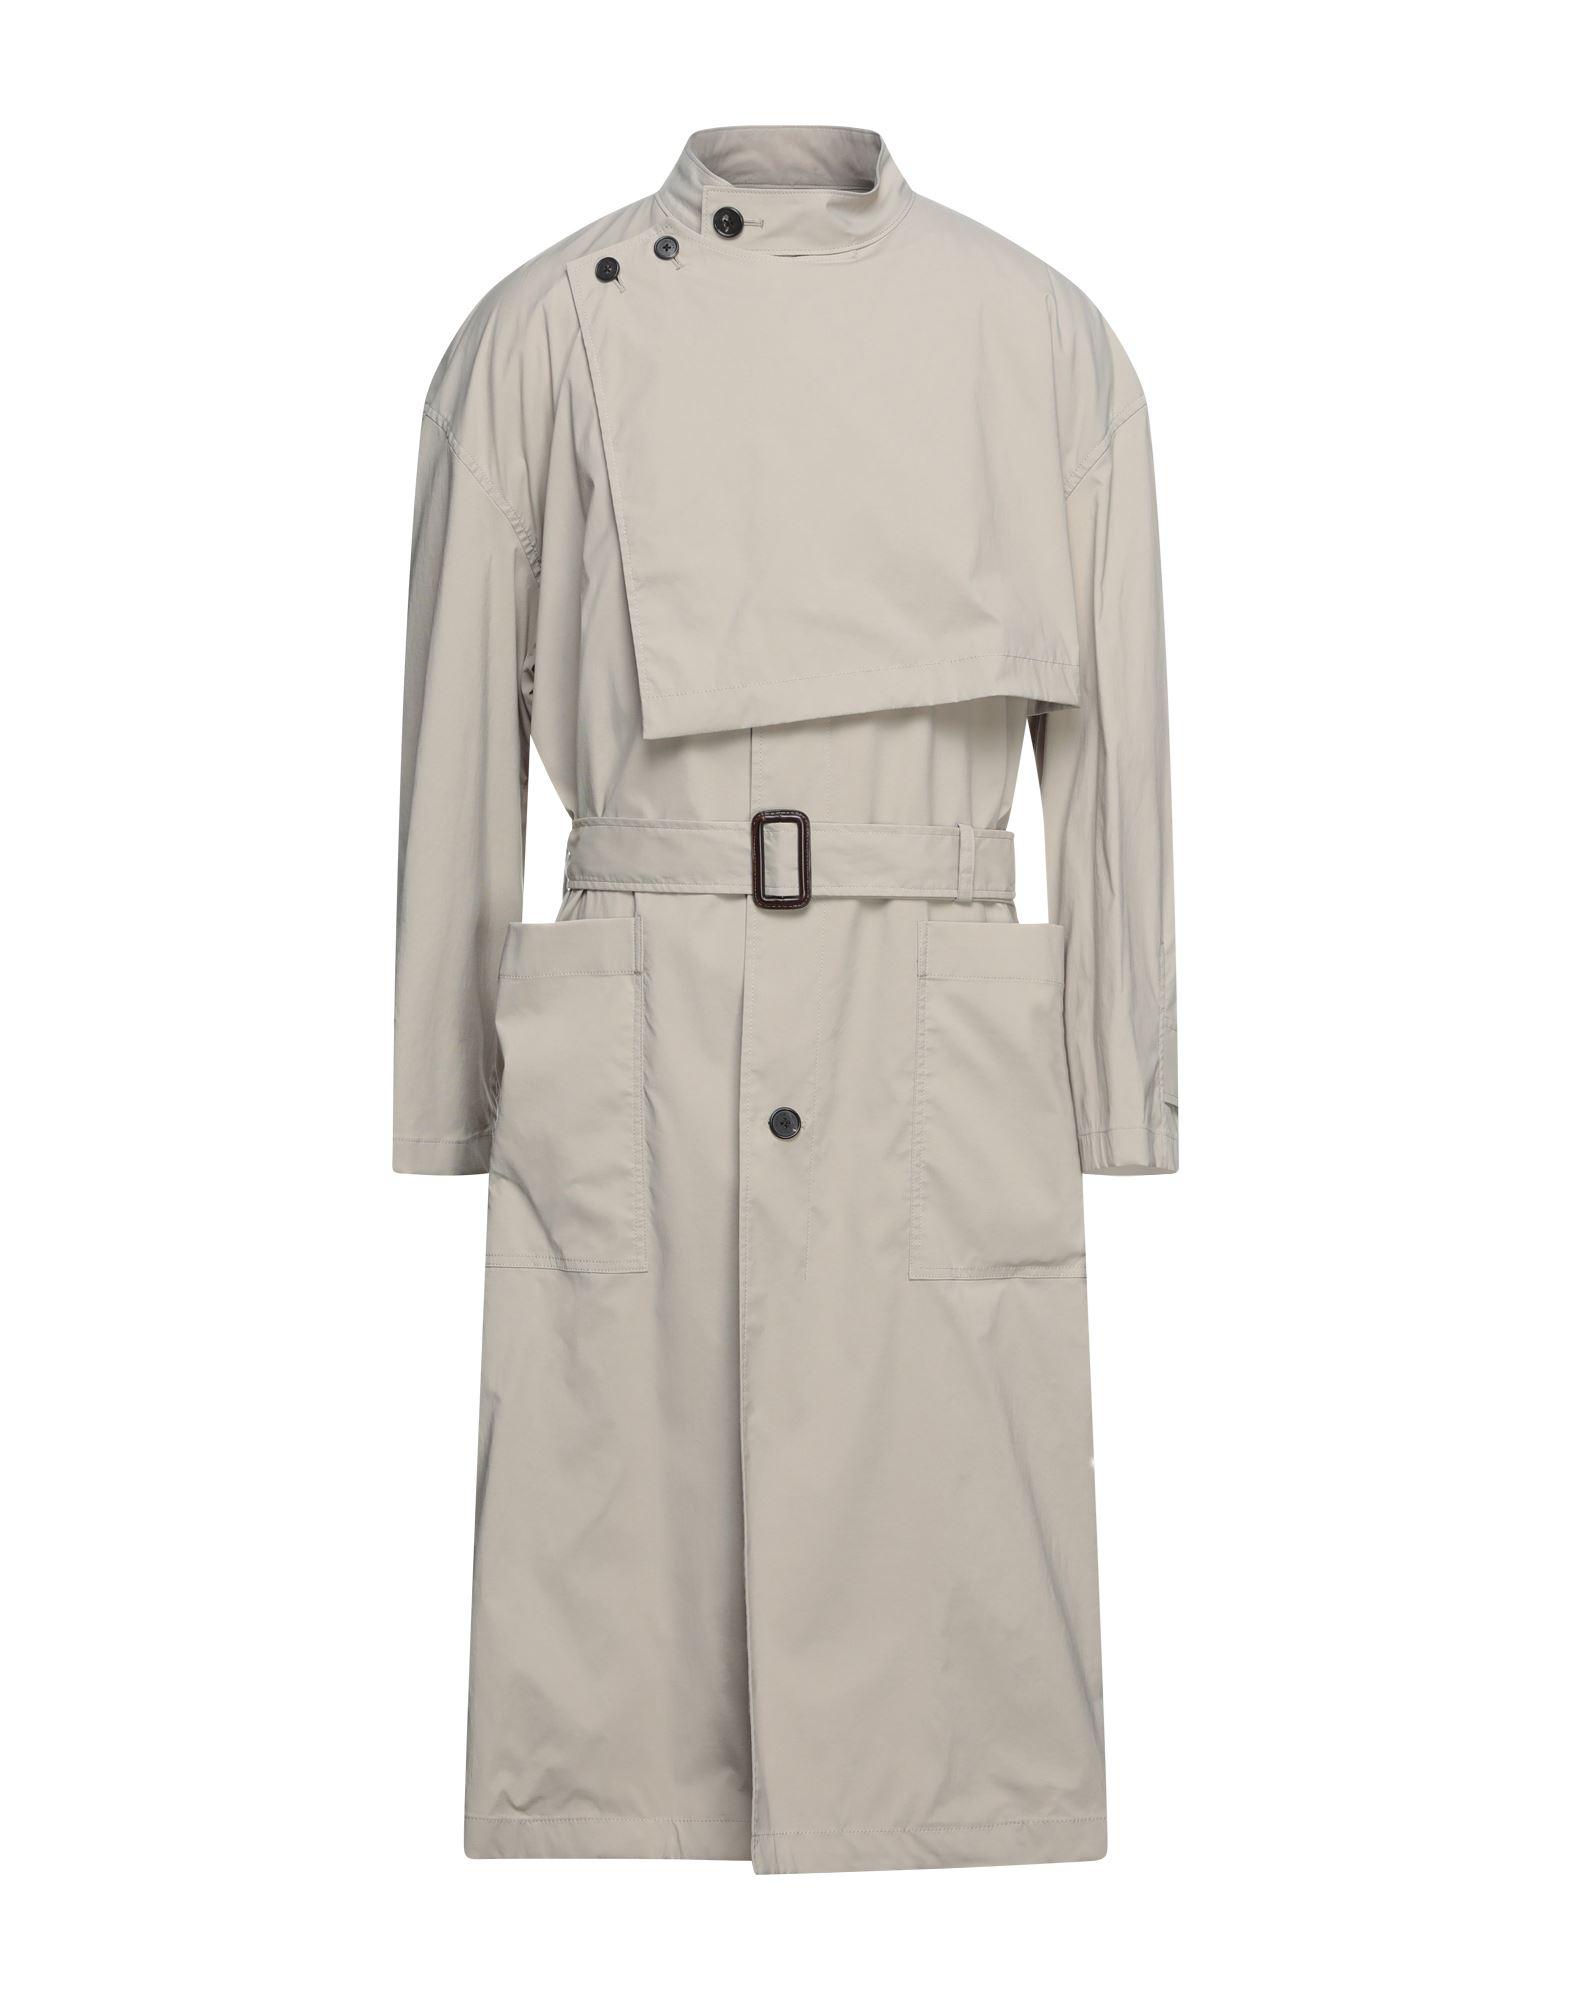 SYSTEM Overcoats - Item 16027702